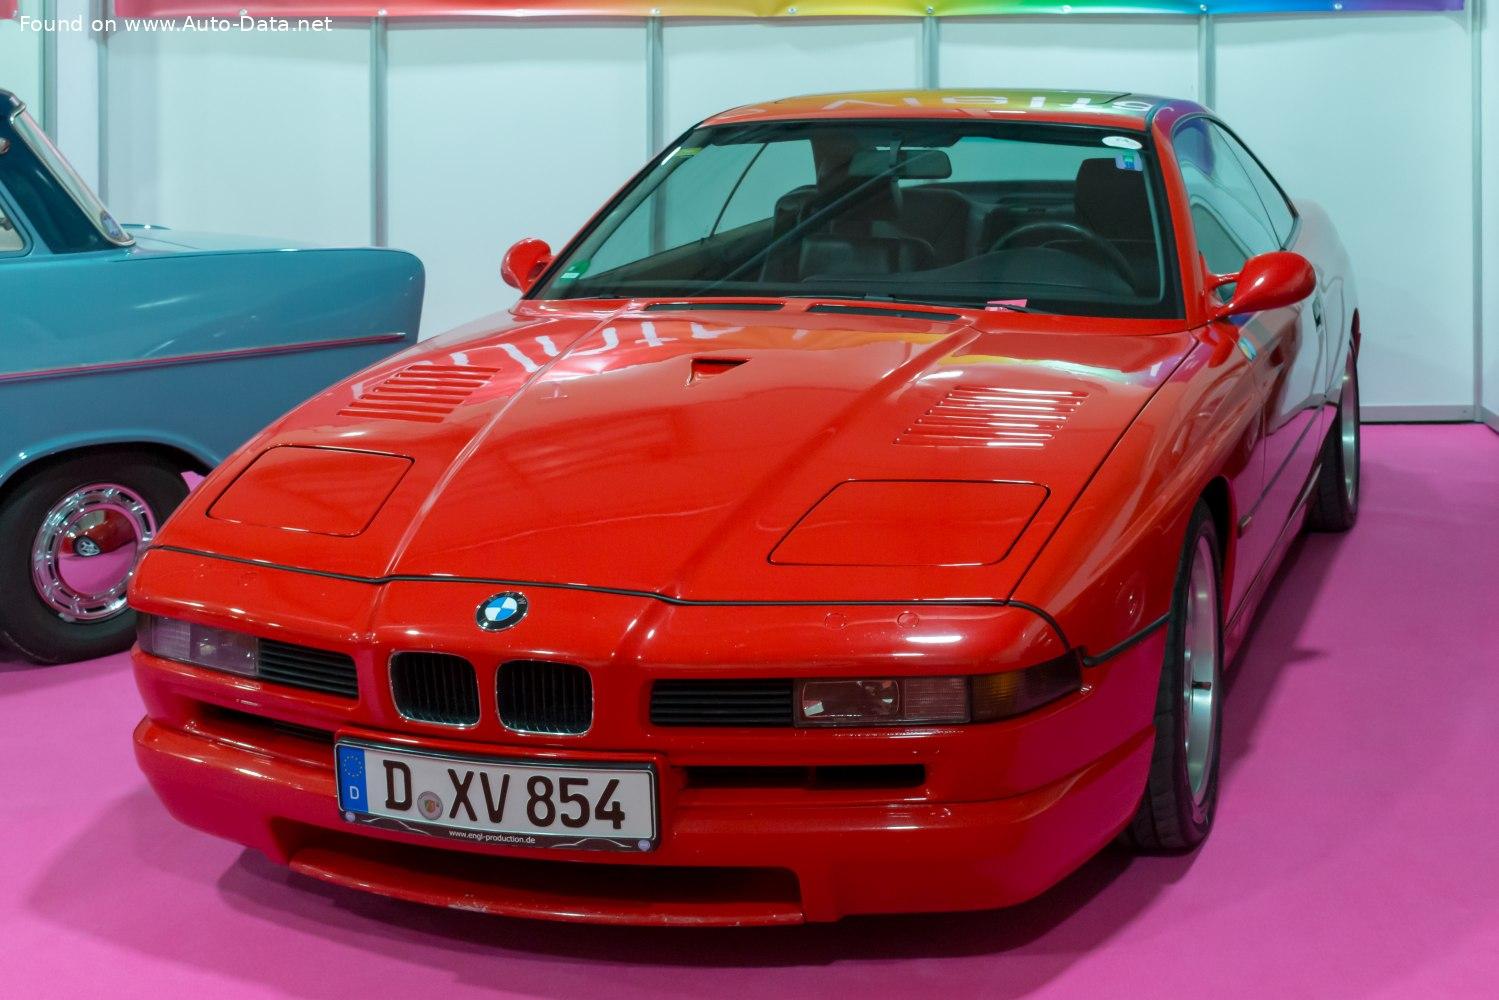 1992 Bmw 8 Series E31 850 Csi 5 6 380 Hp Technical Specs Data Fuel Consumption Dimensions